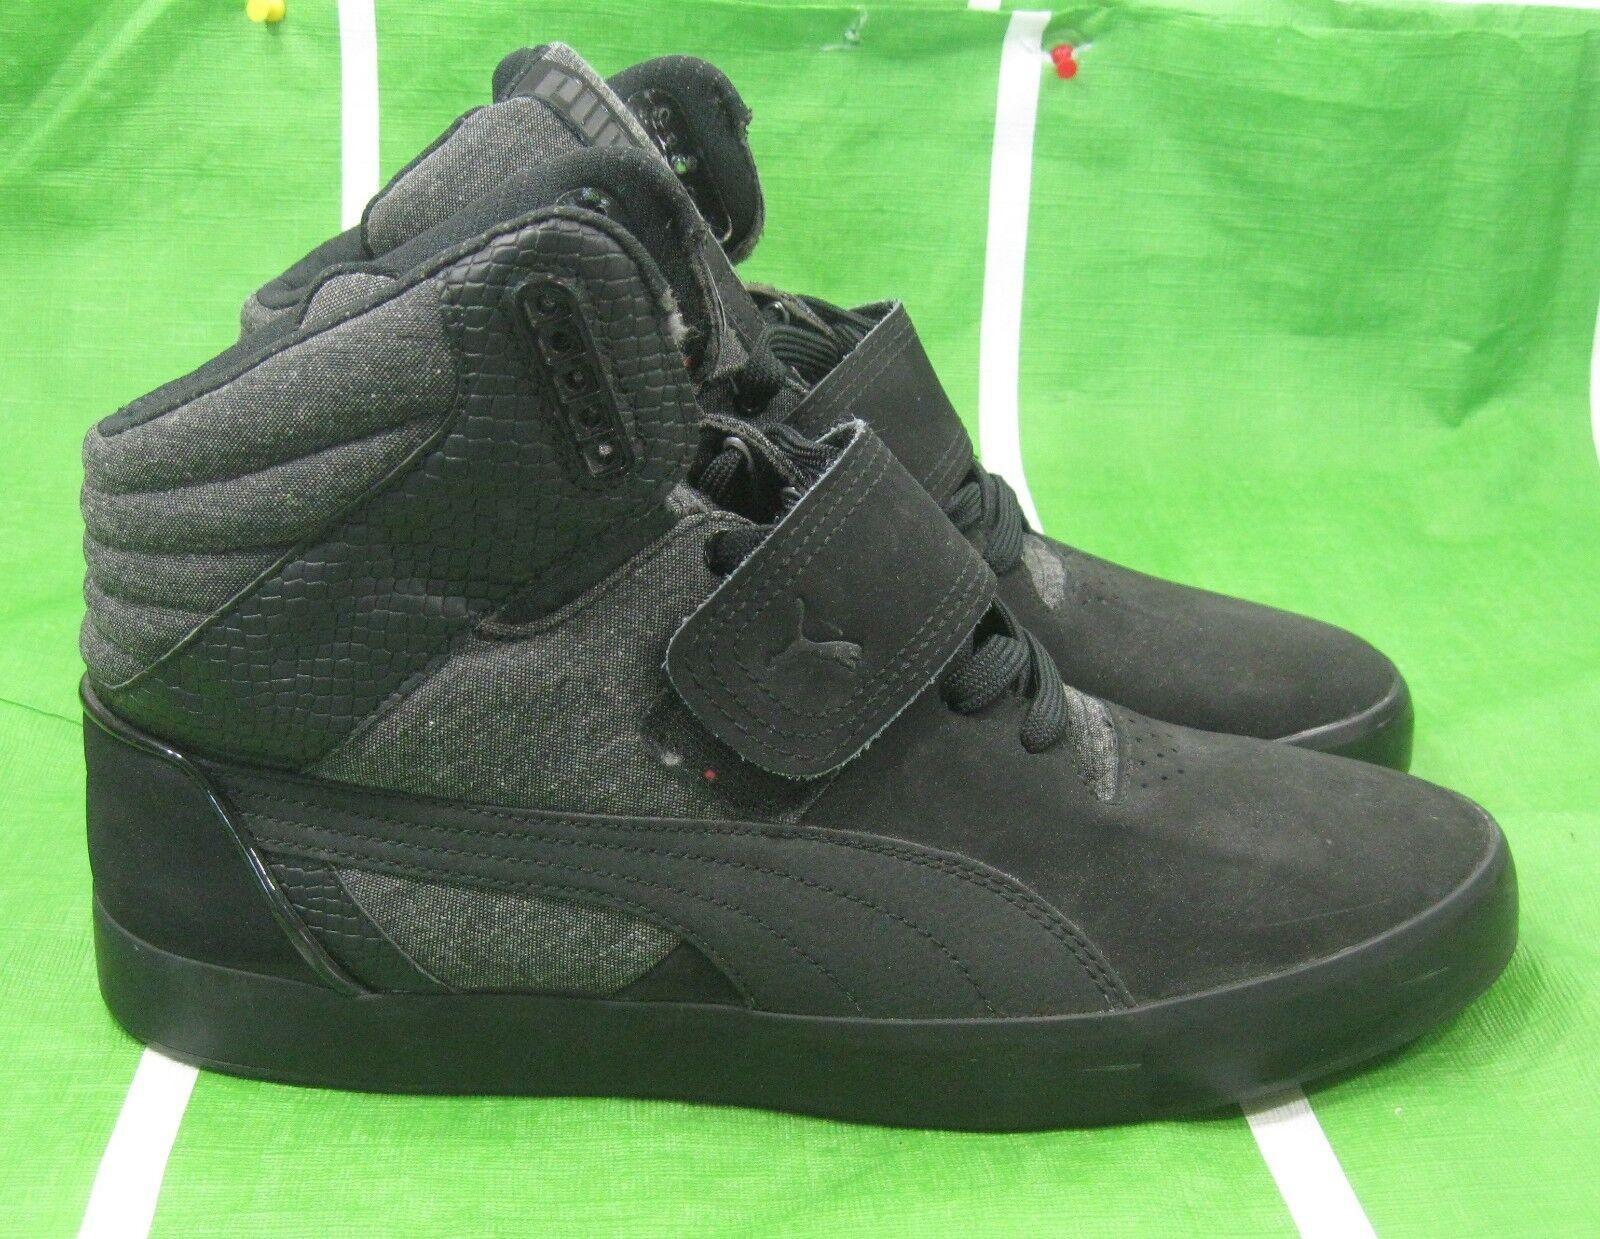 PUMA shoes Suburb Hi Top Strap Cham Men  355434 01 Medium Width black SIZE 11